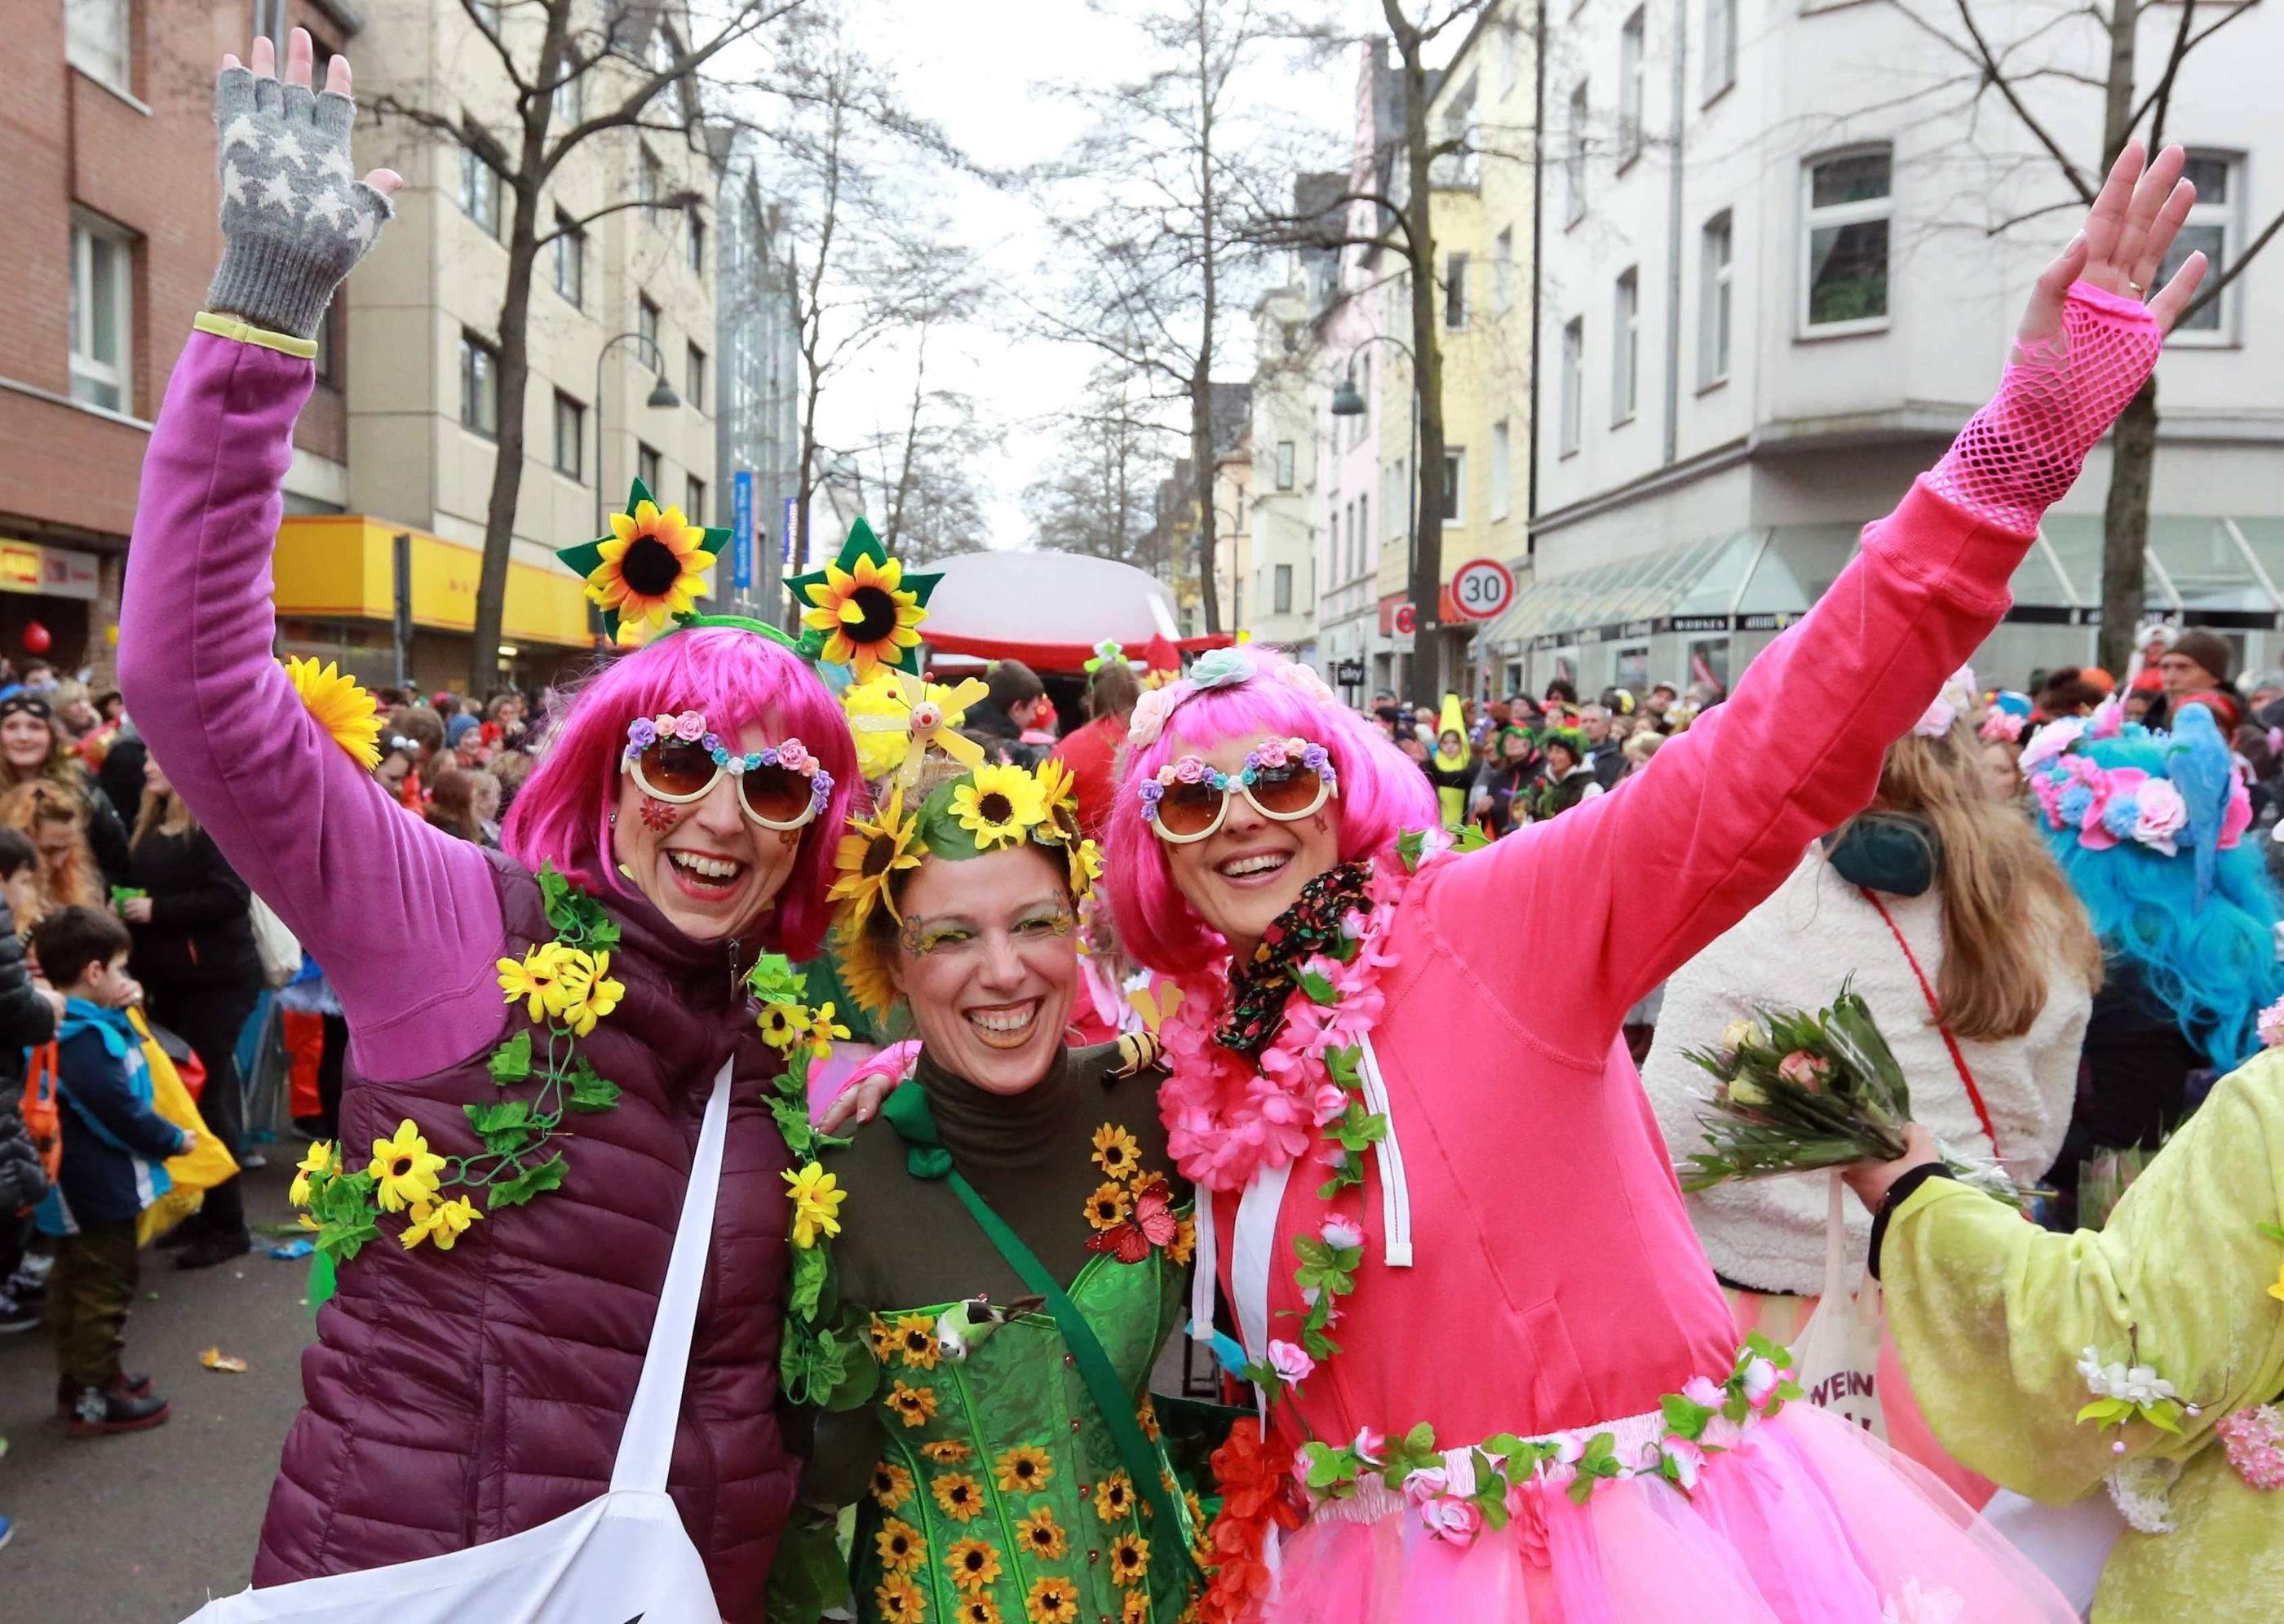 Karneval 2019 Tipps Fur Last Minute Karnevalskostume